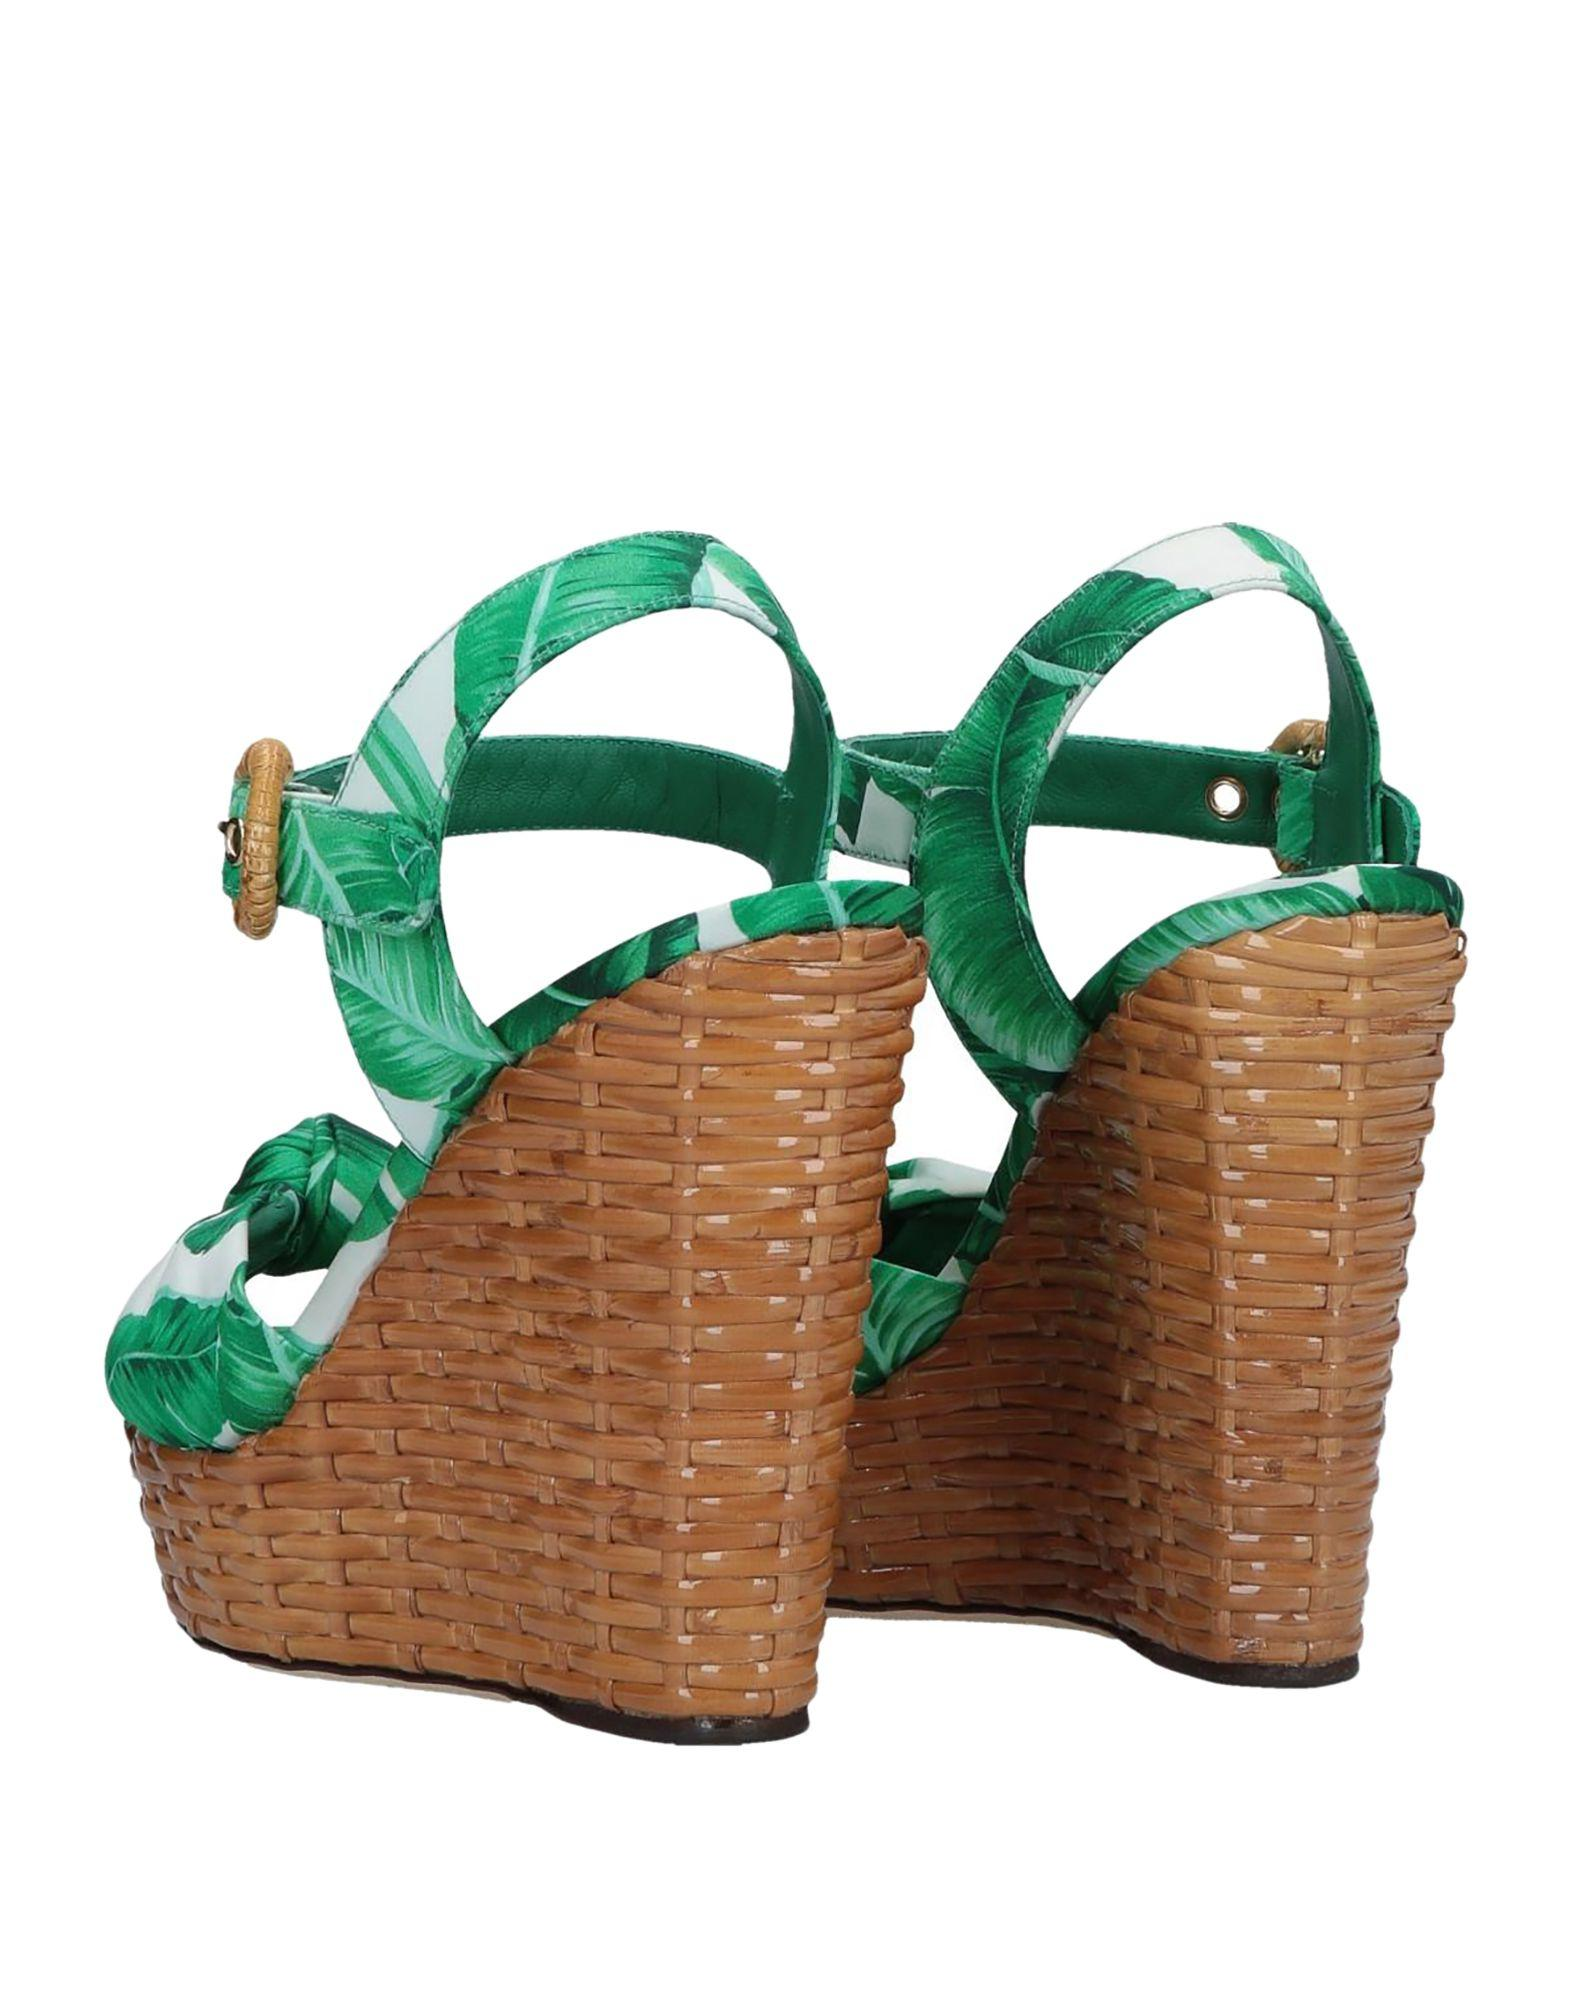 45bd6959f6c Dolce   Gabbana Sandals in Green - Lyst